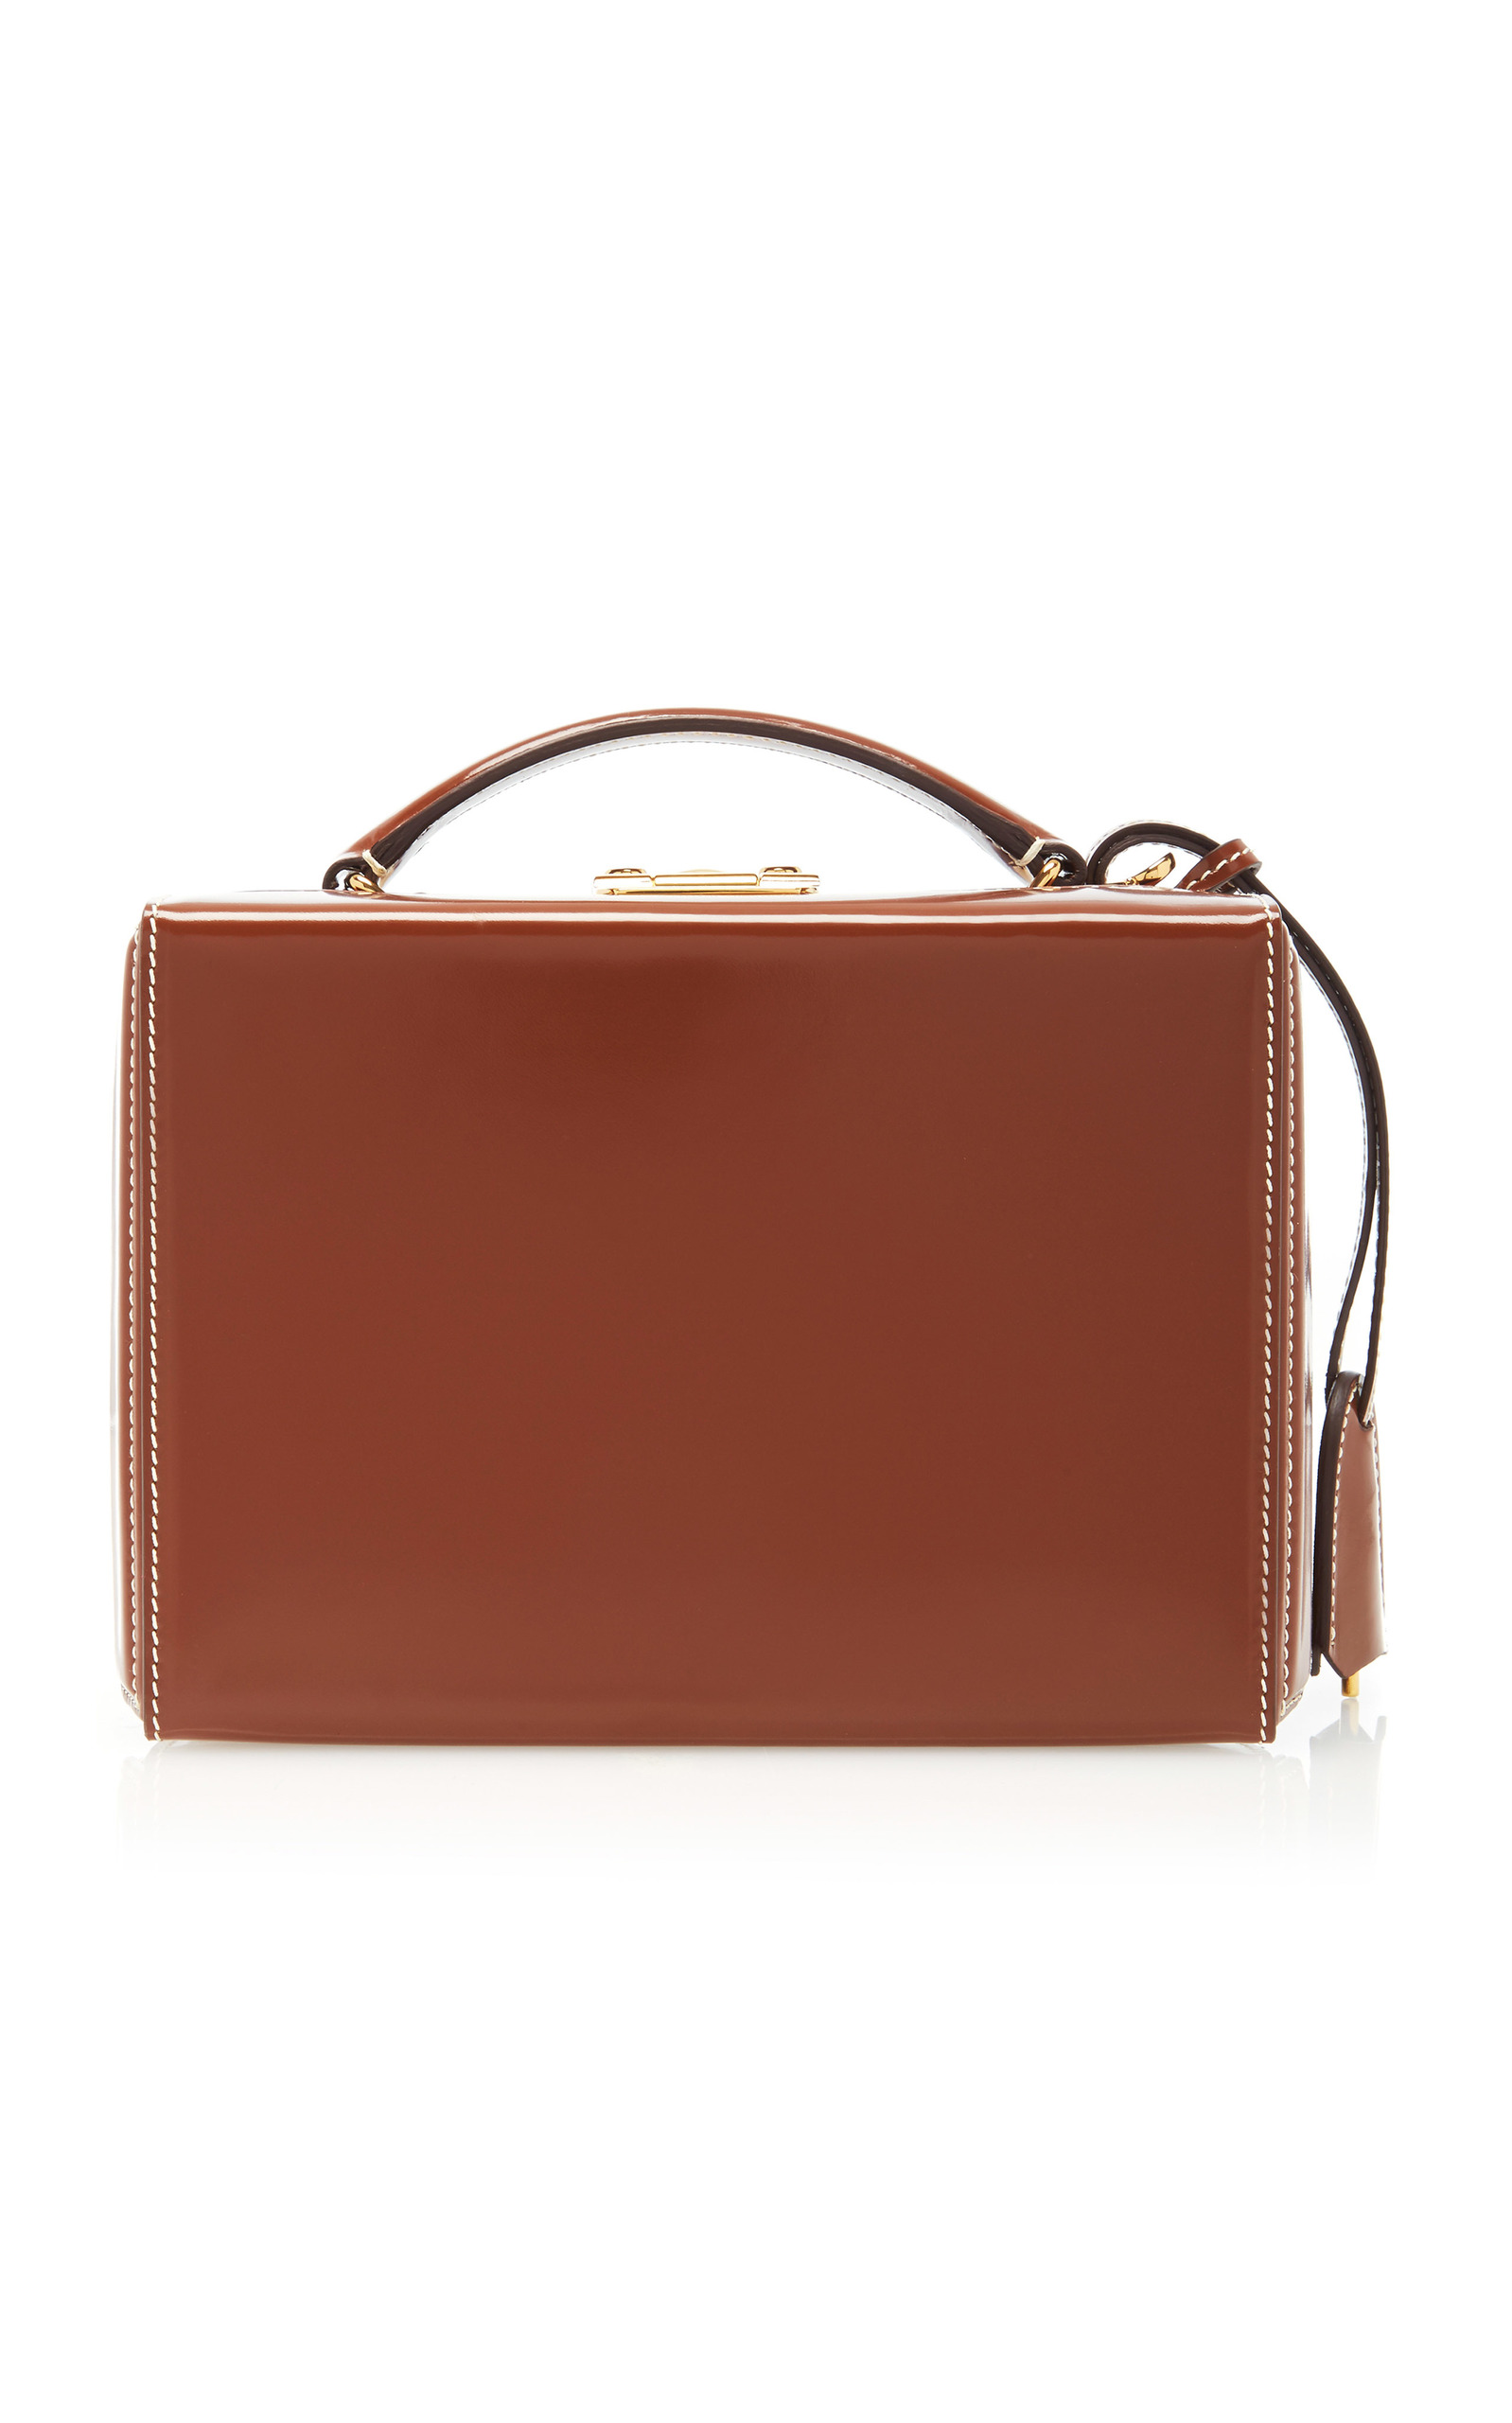 b4b77af624f6 Mark CrossGrace Small Leather Box Bag. CLOSE. Loading